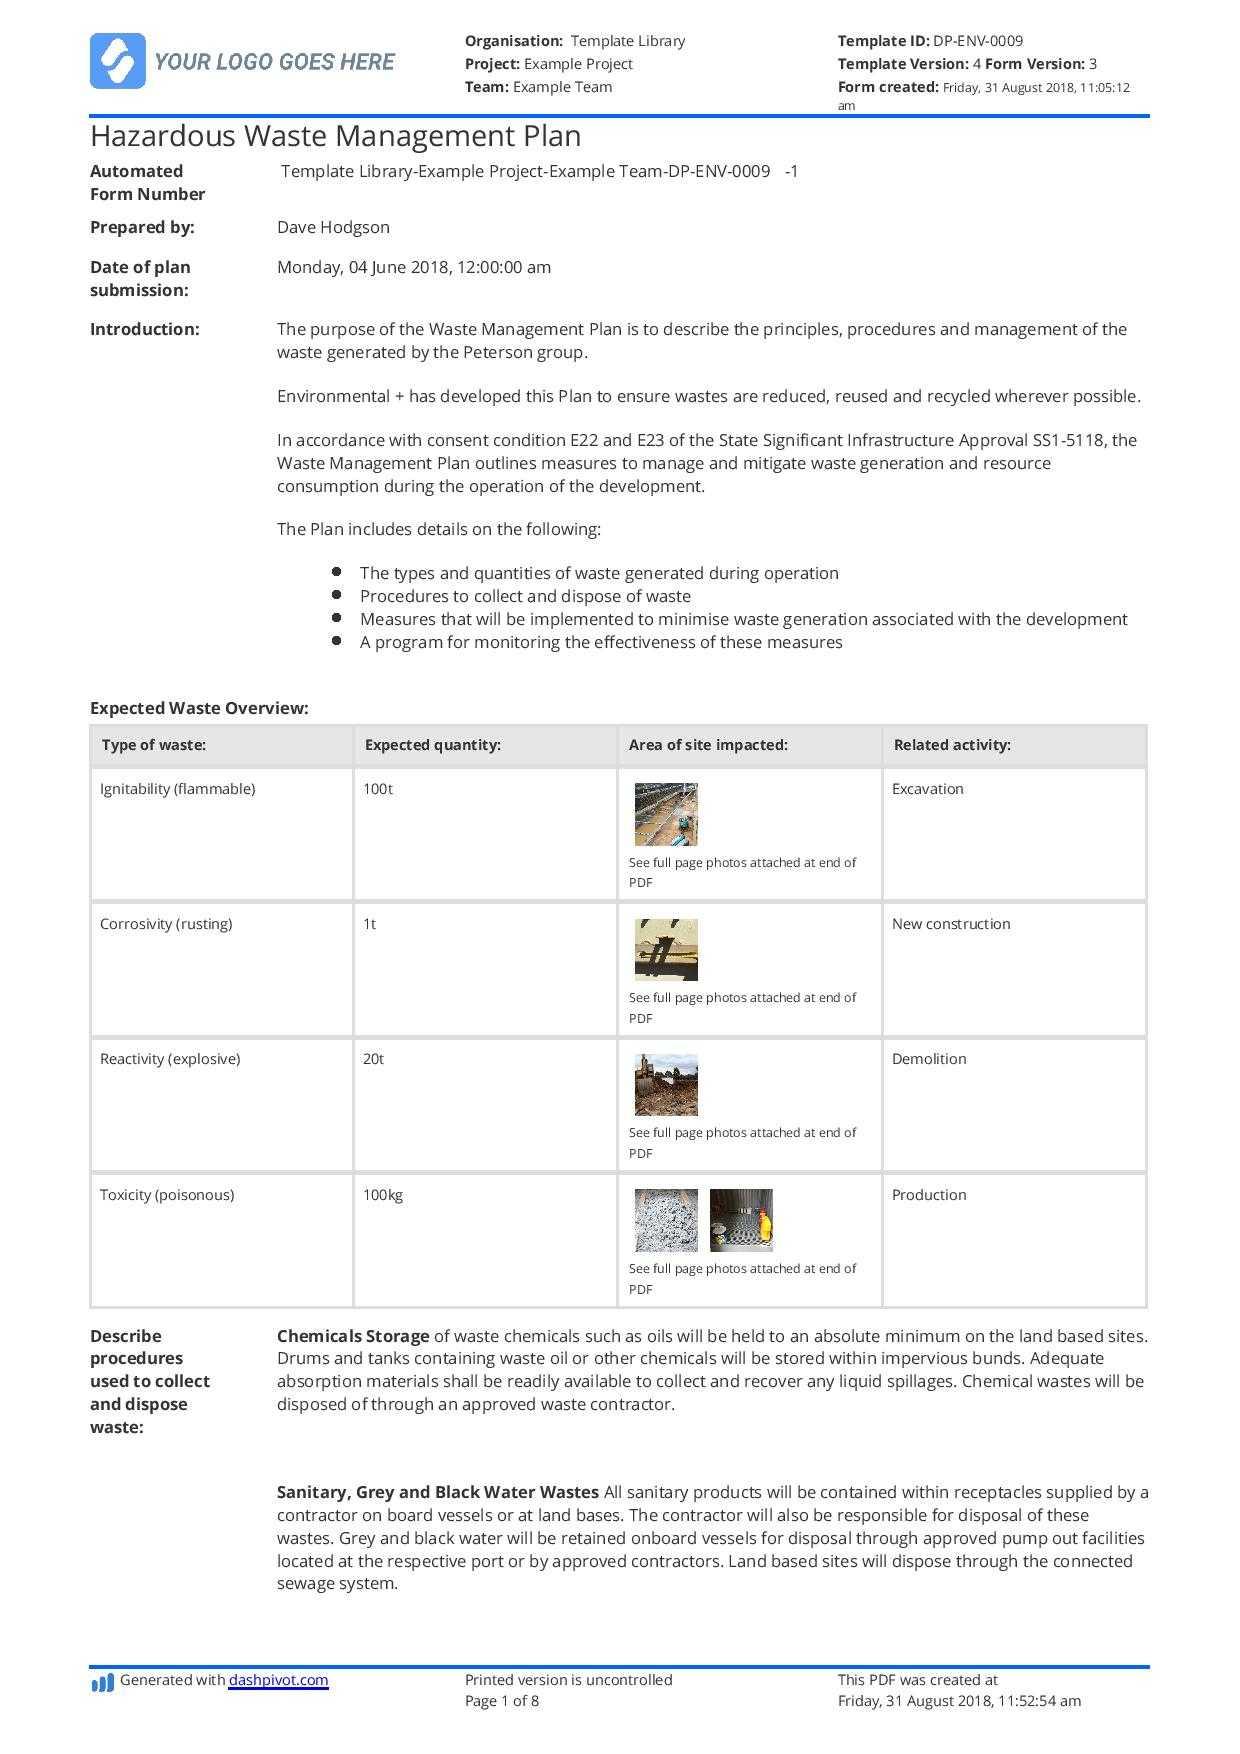 Hazardous Waste Management Plan Template - Free And Editable Regarding Waste Management Report Template